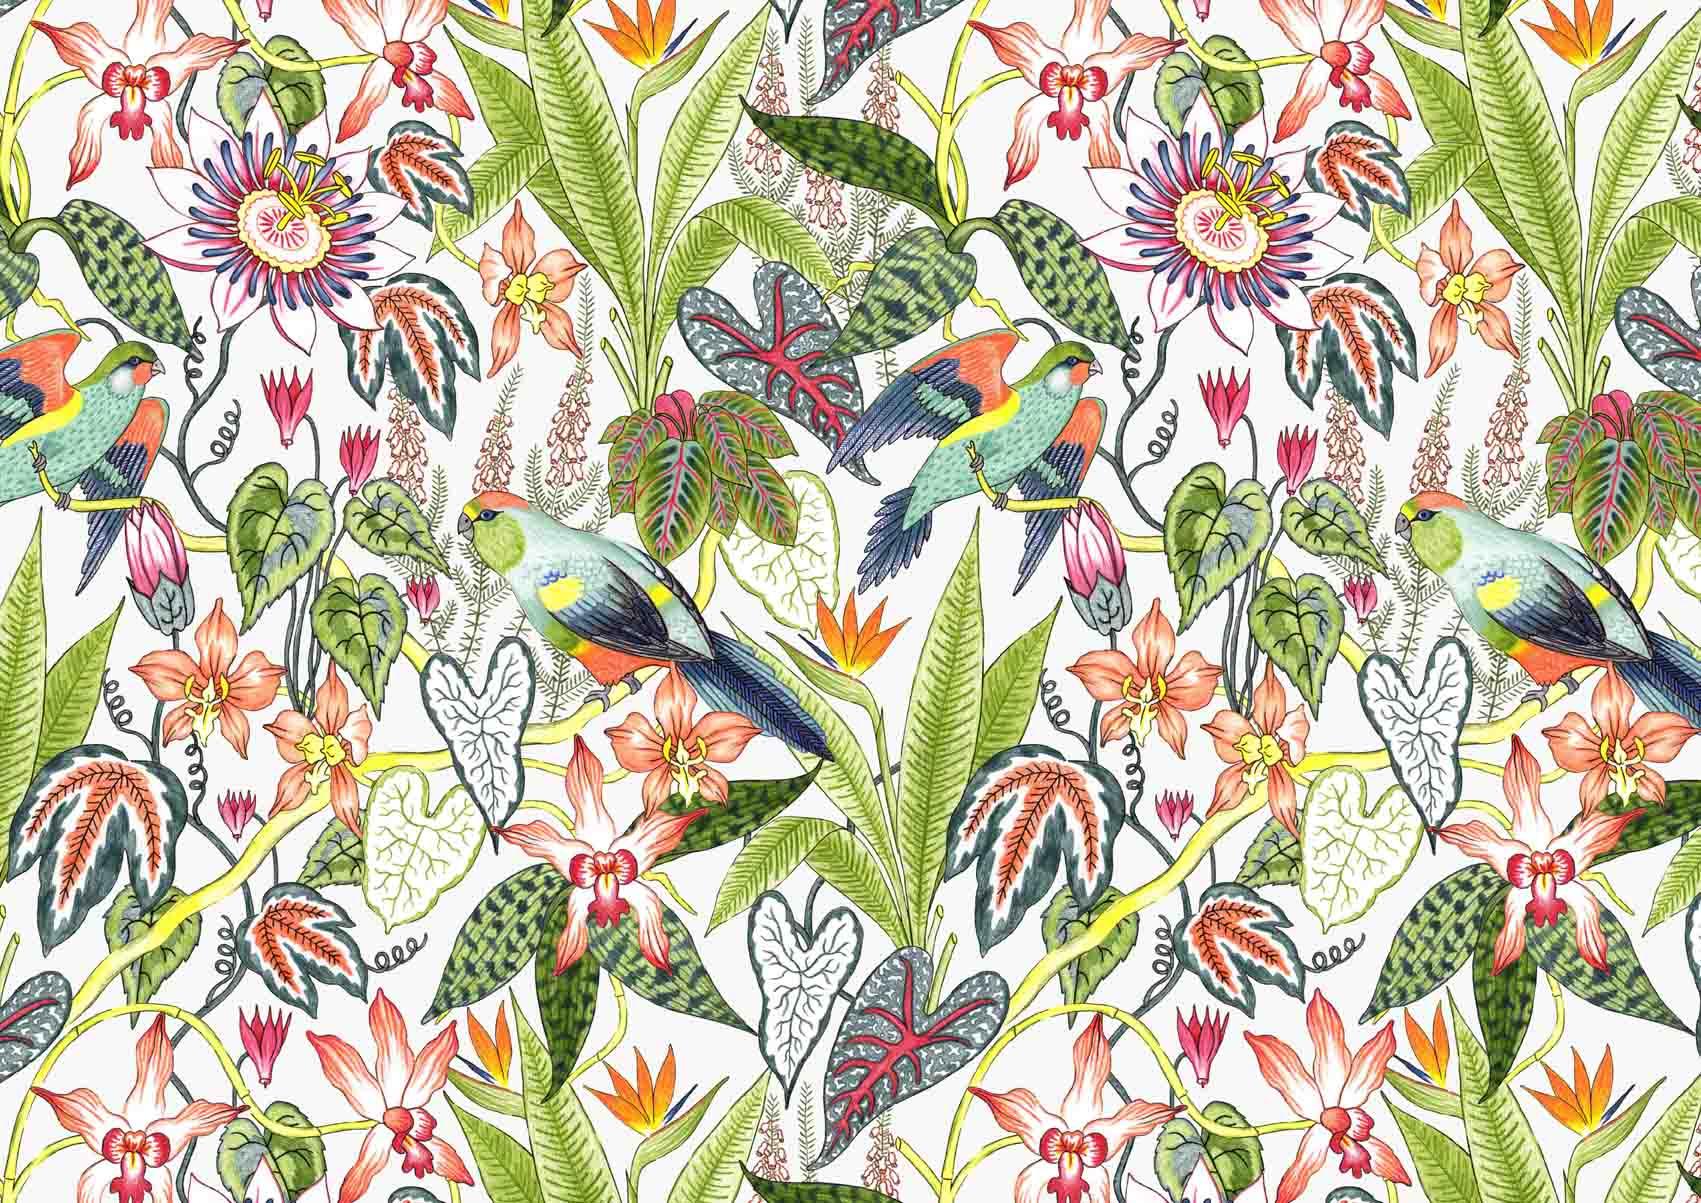 Derwent-Tropical-Pencil-set-Illustration-Pattern-Jacqueline-Colley-2.jpg